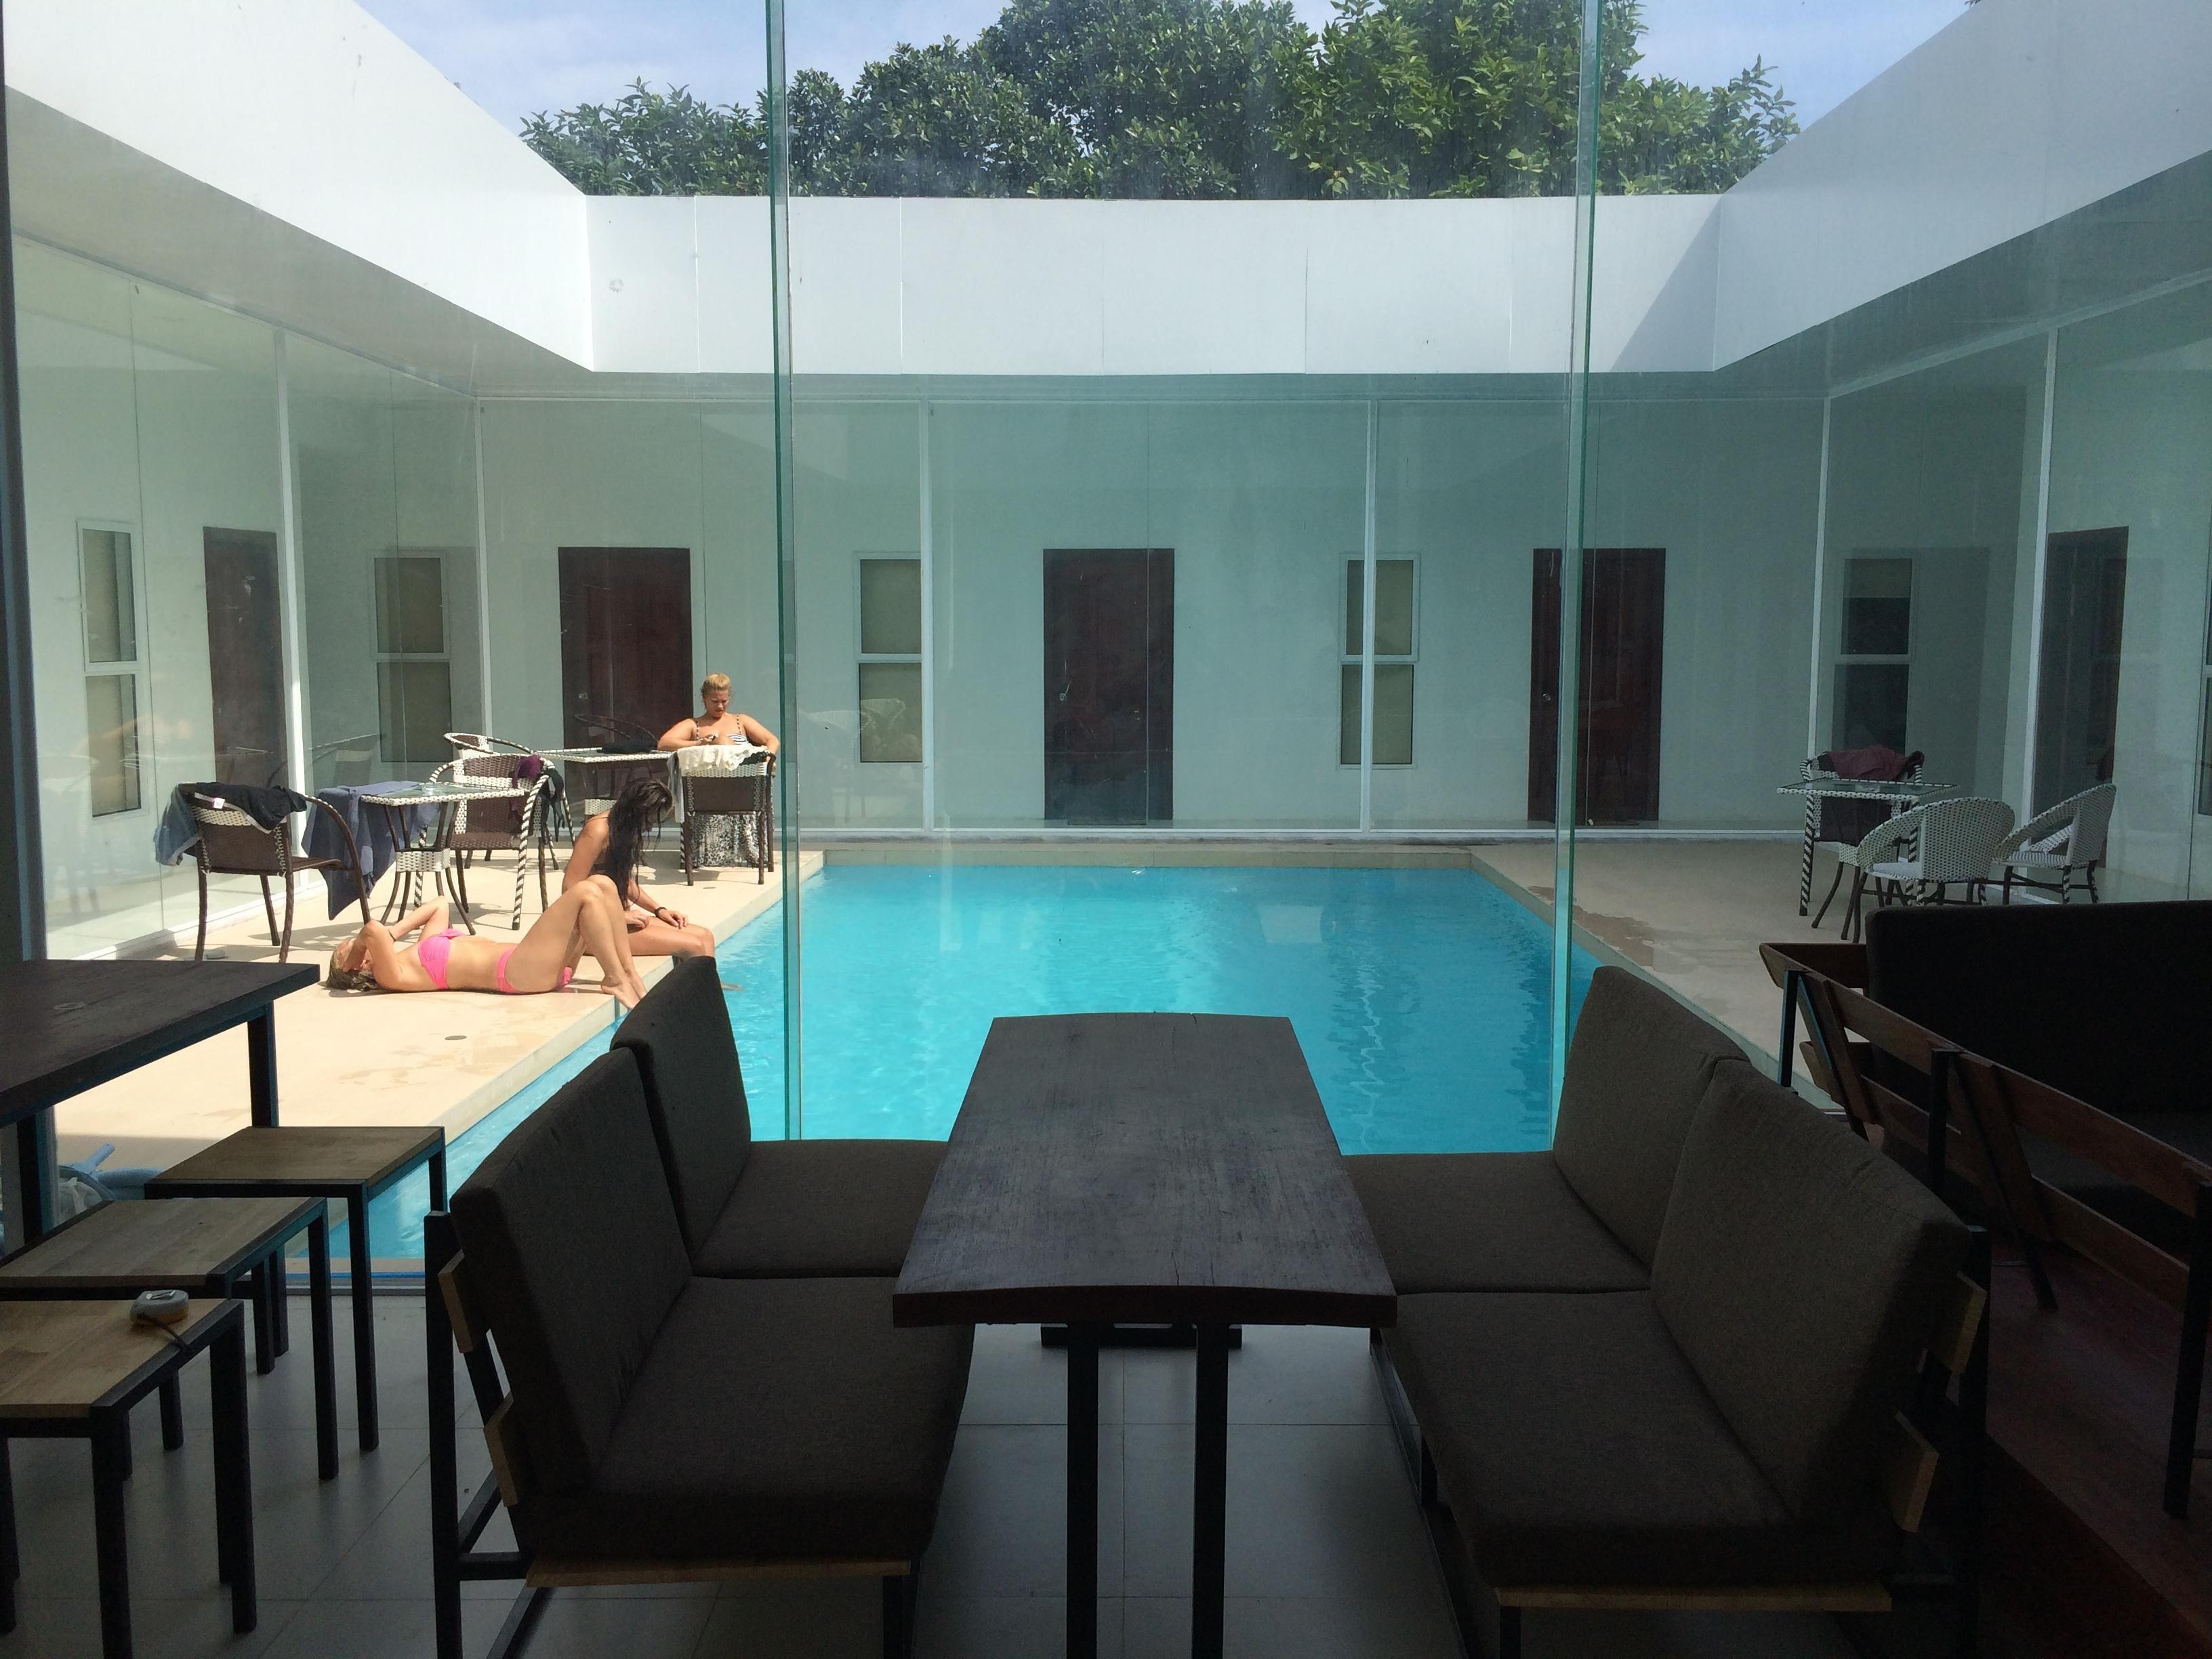 7 Days Premium Hotel Chengdu Yanshi Kou Branch Sihanoukville One Stop Hostel Sihanoukville Cambodia Asia One